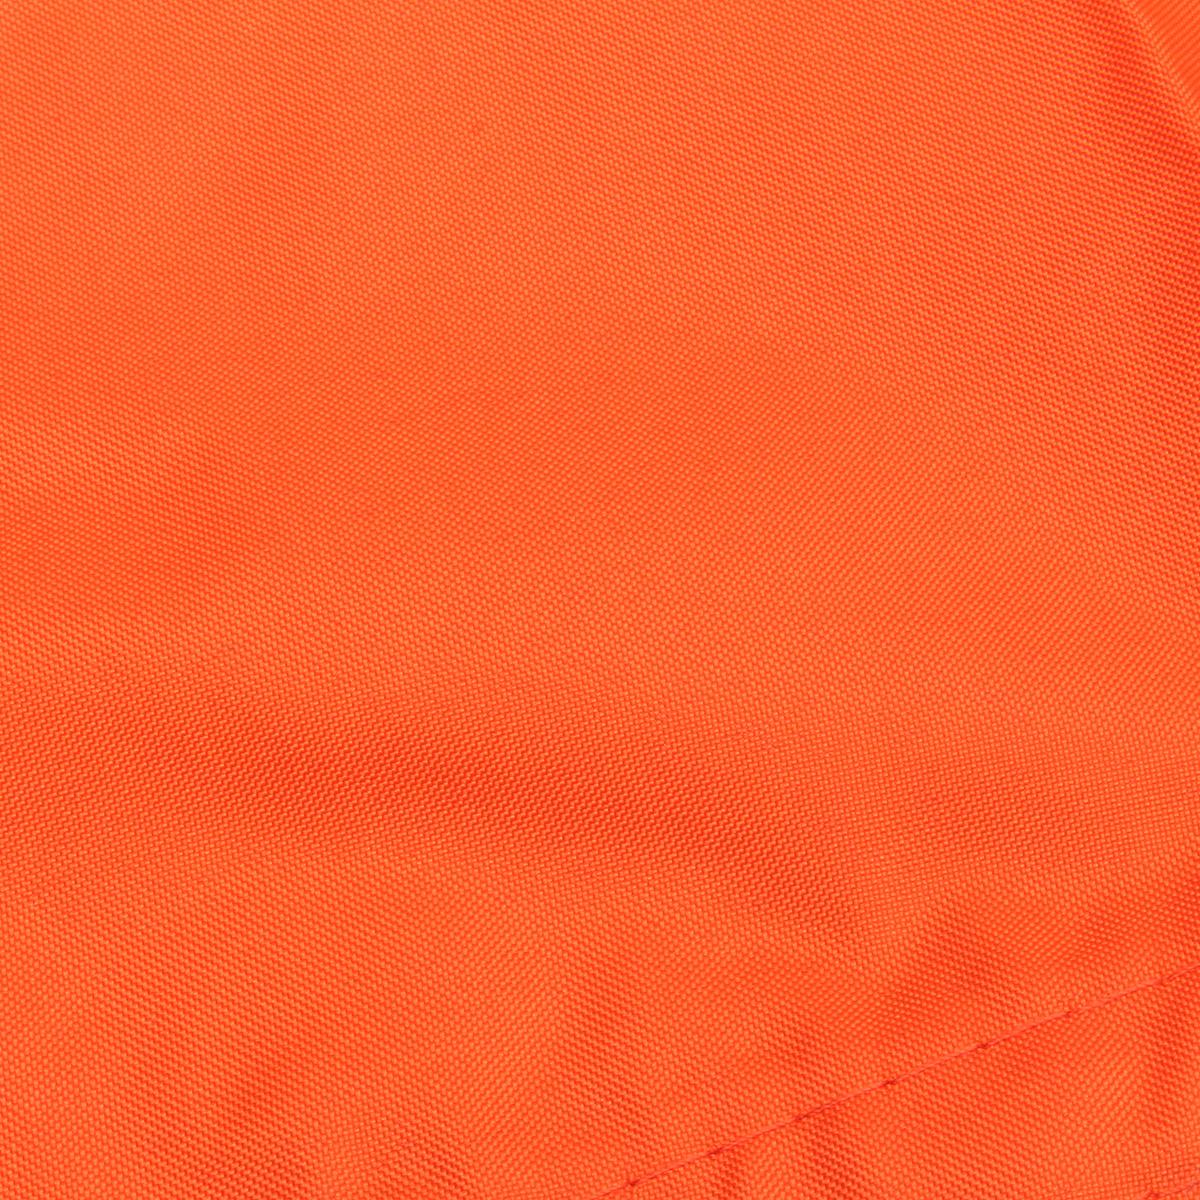 3x3x3m Triangular Shade Cloth Oxford Fabric Waterproof UV-Ray Proof Sunshade Canopy Outdoor Camping Garden Pool